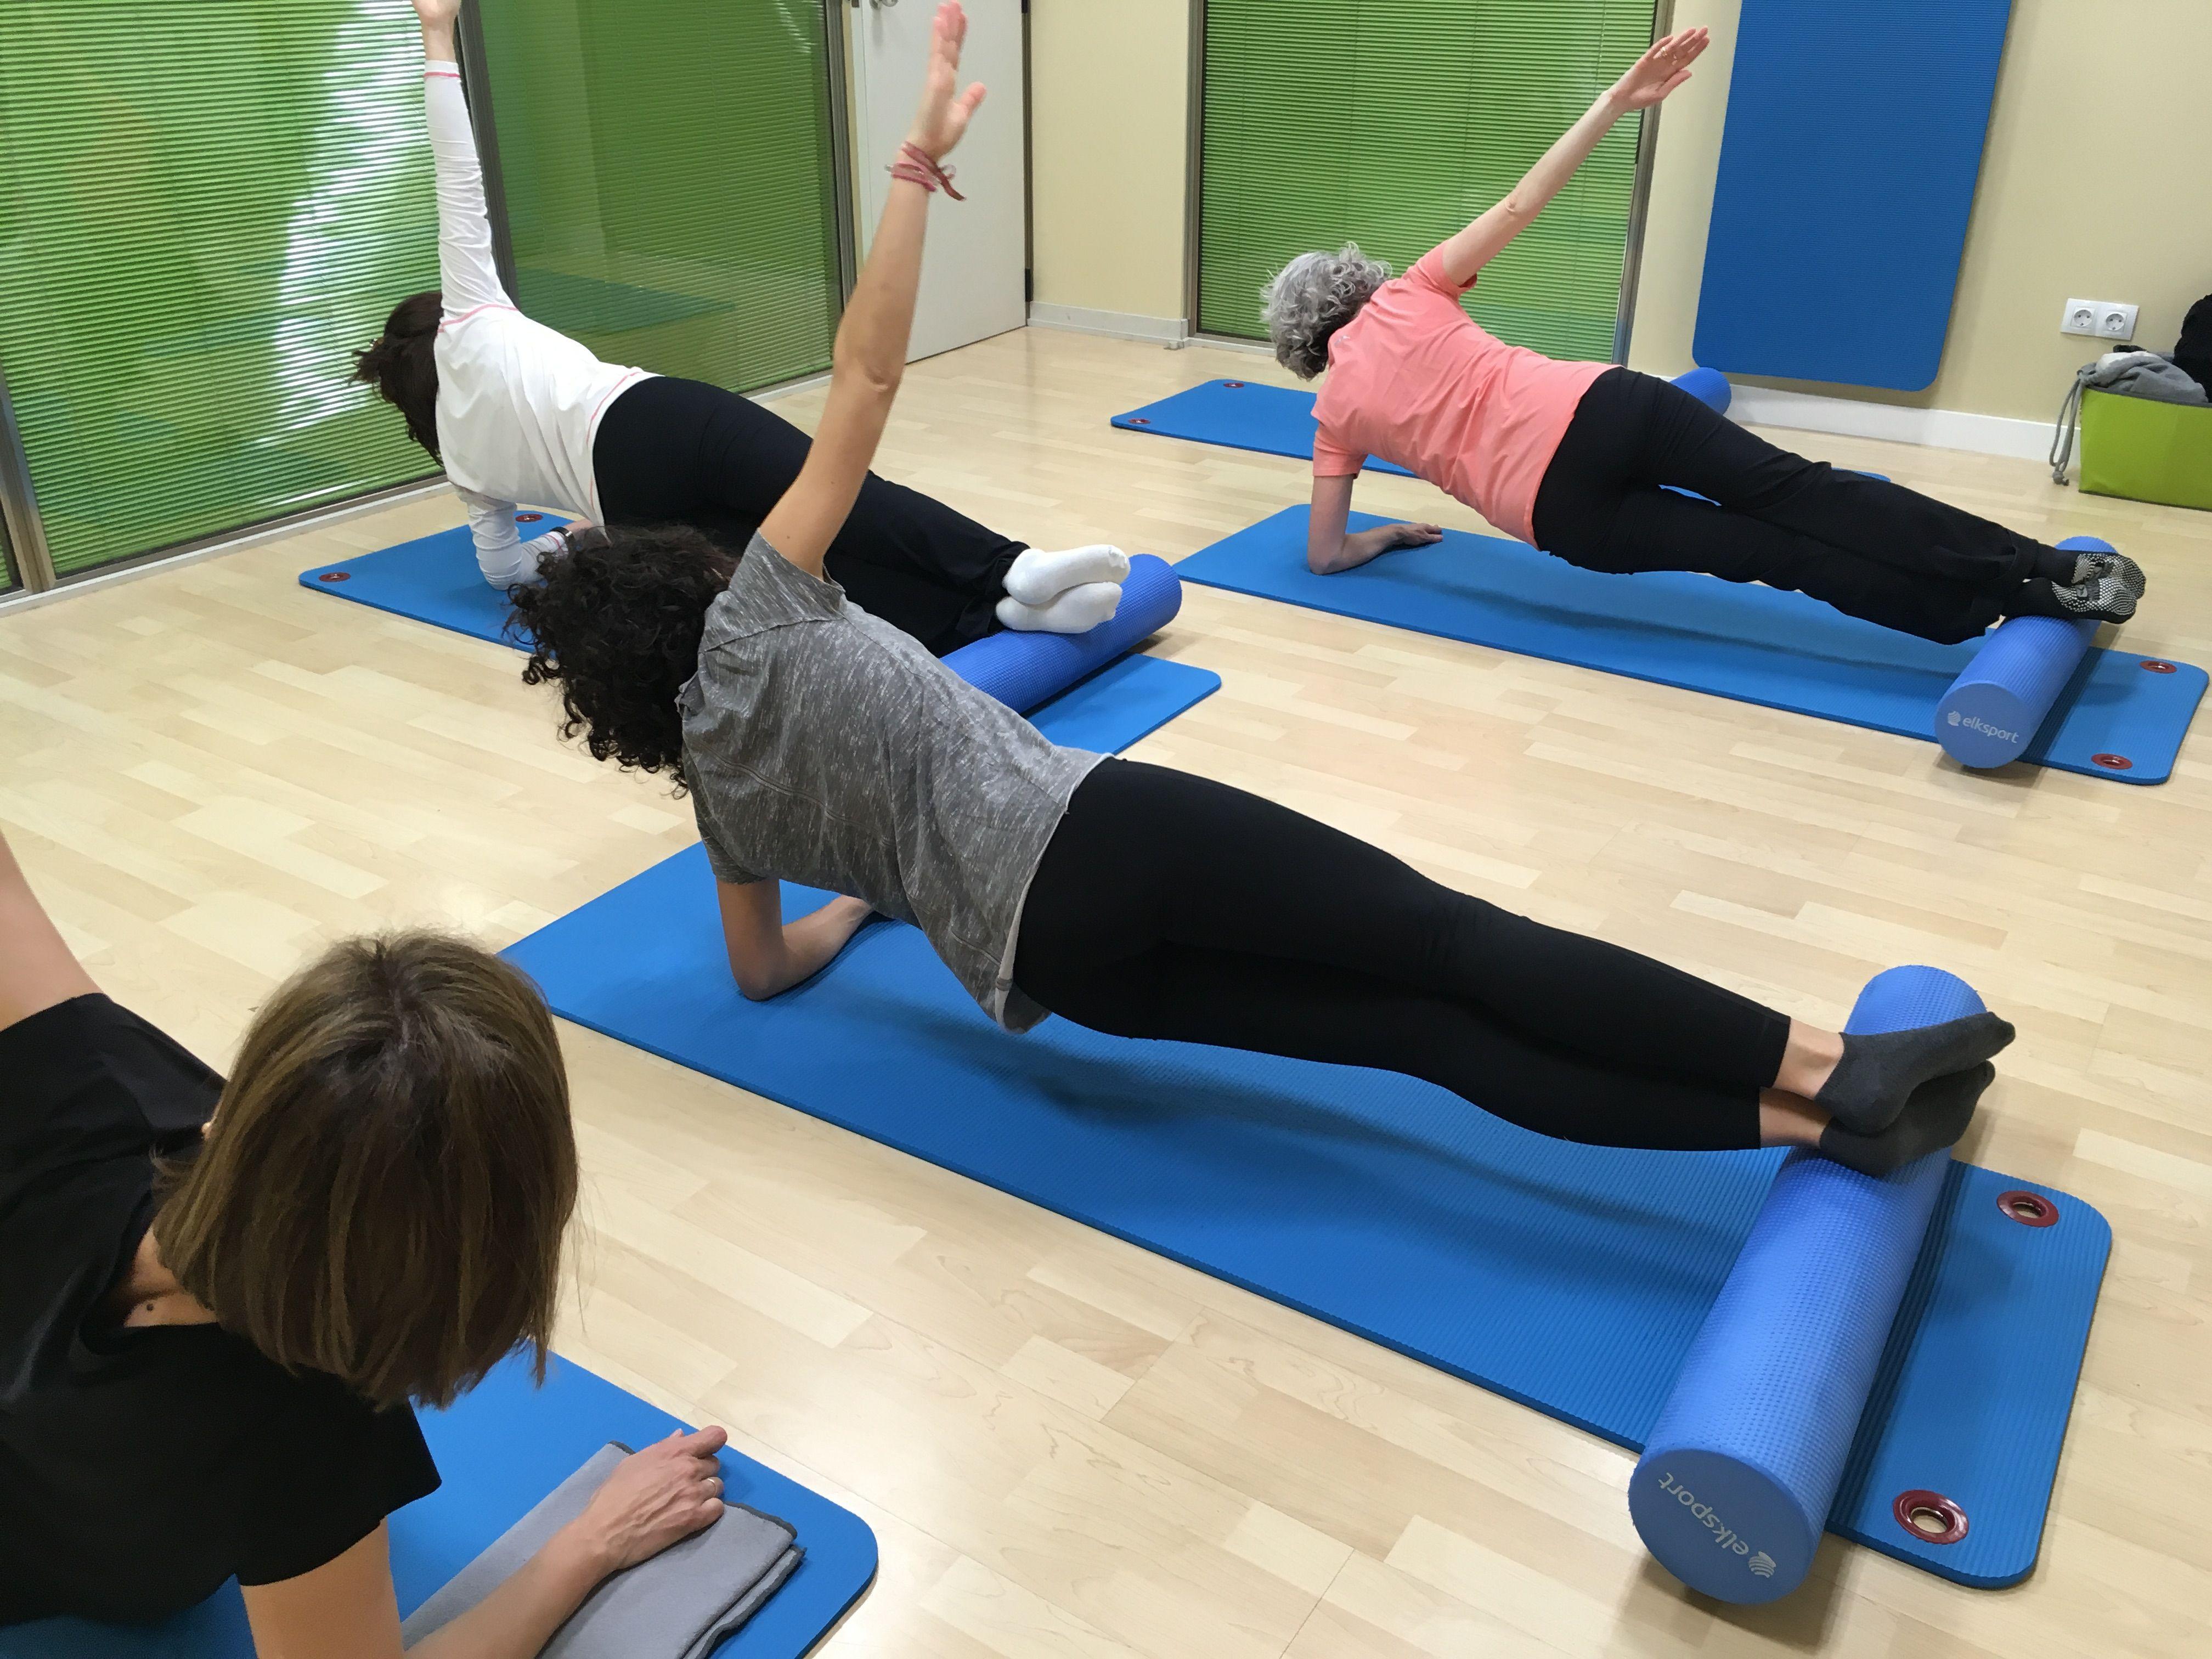 Clases de Pilates seniors en Zaragoza